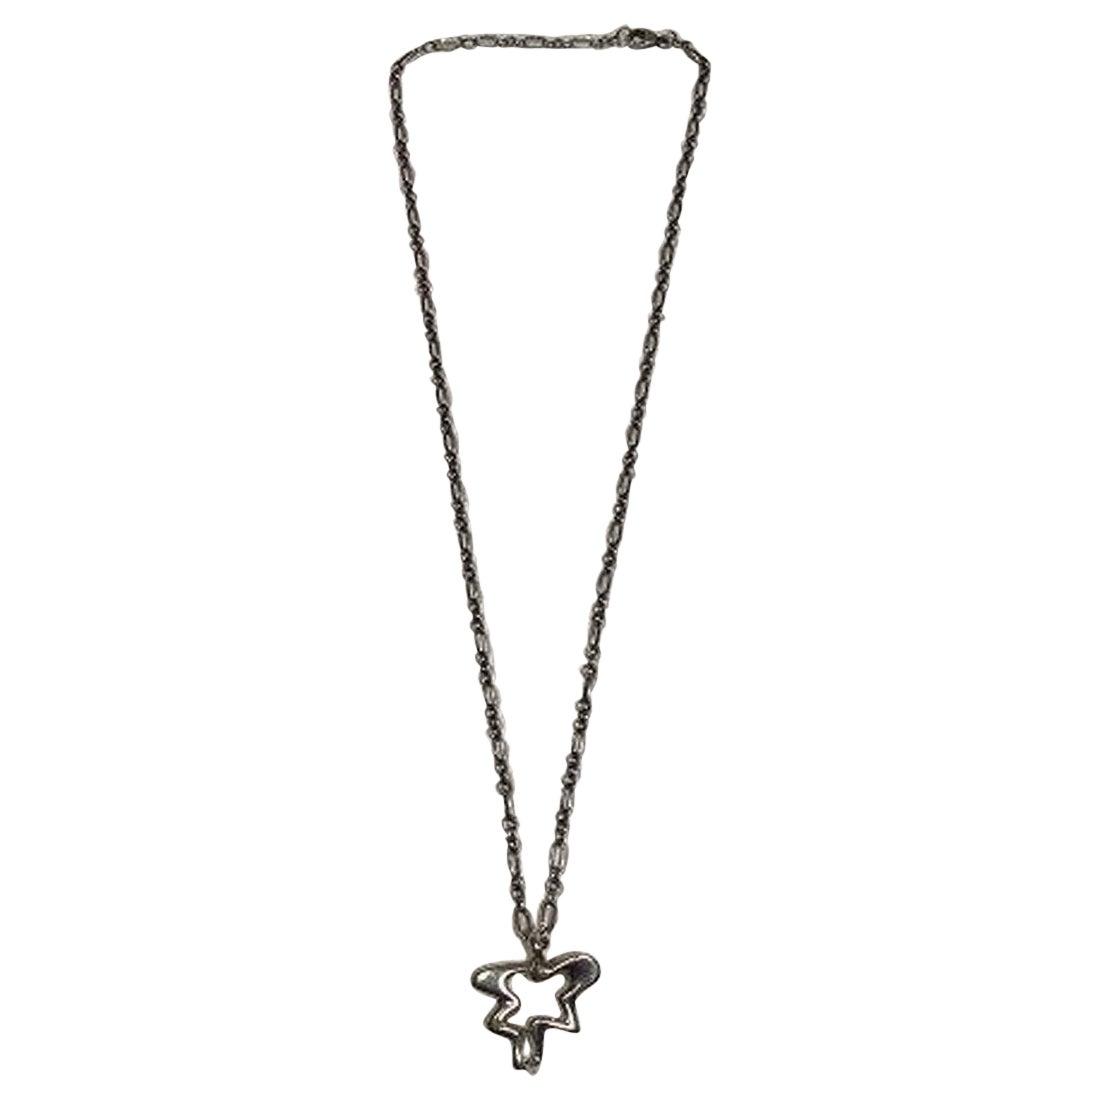 Georg Jensen Sterling Silver Necklace with Splash Pendant